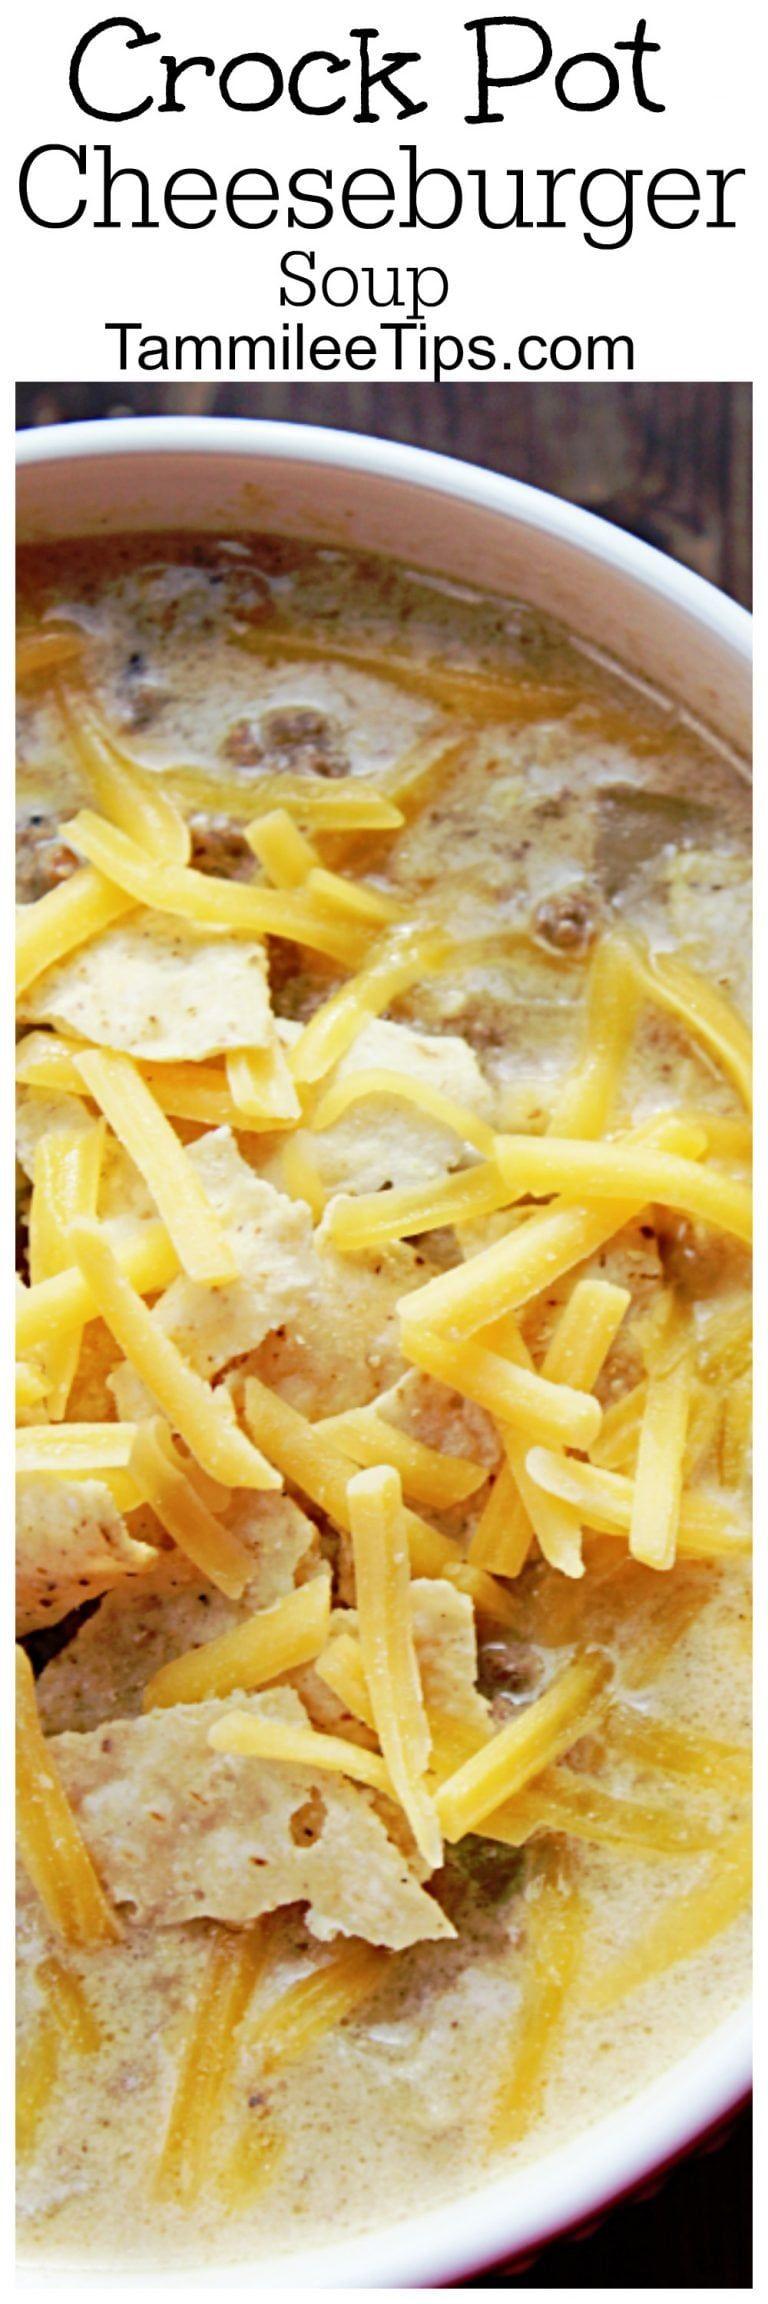 Crock Pot Cheeseburger Soup #crockpotgumbo